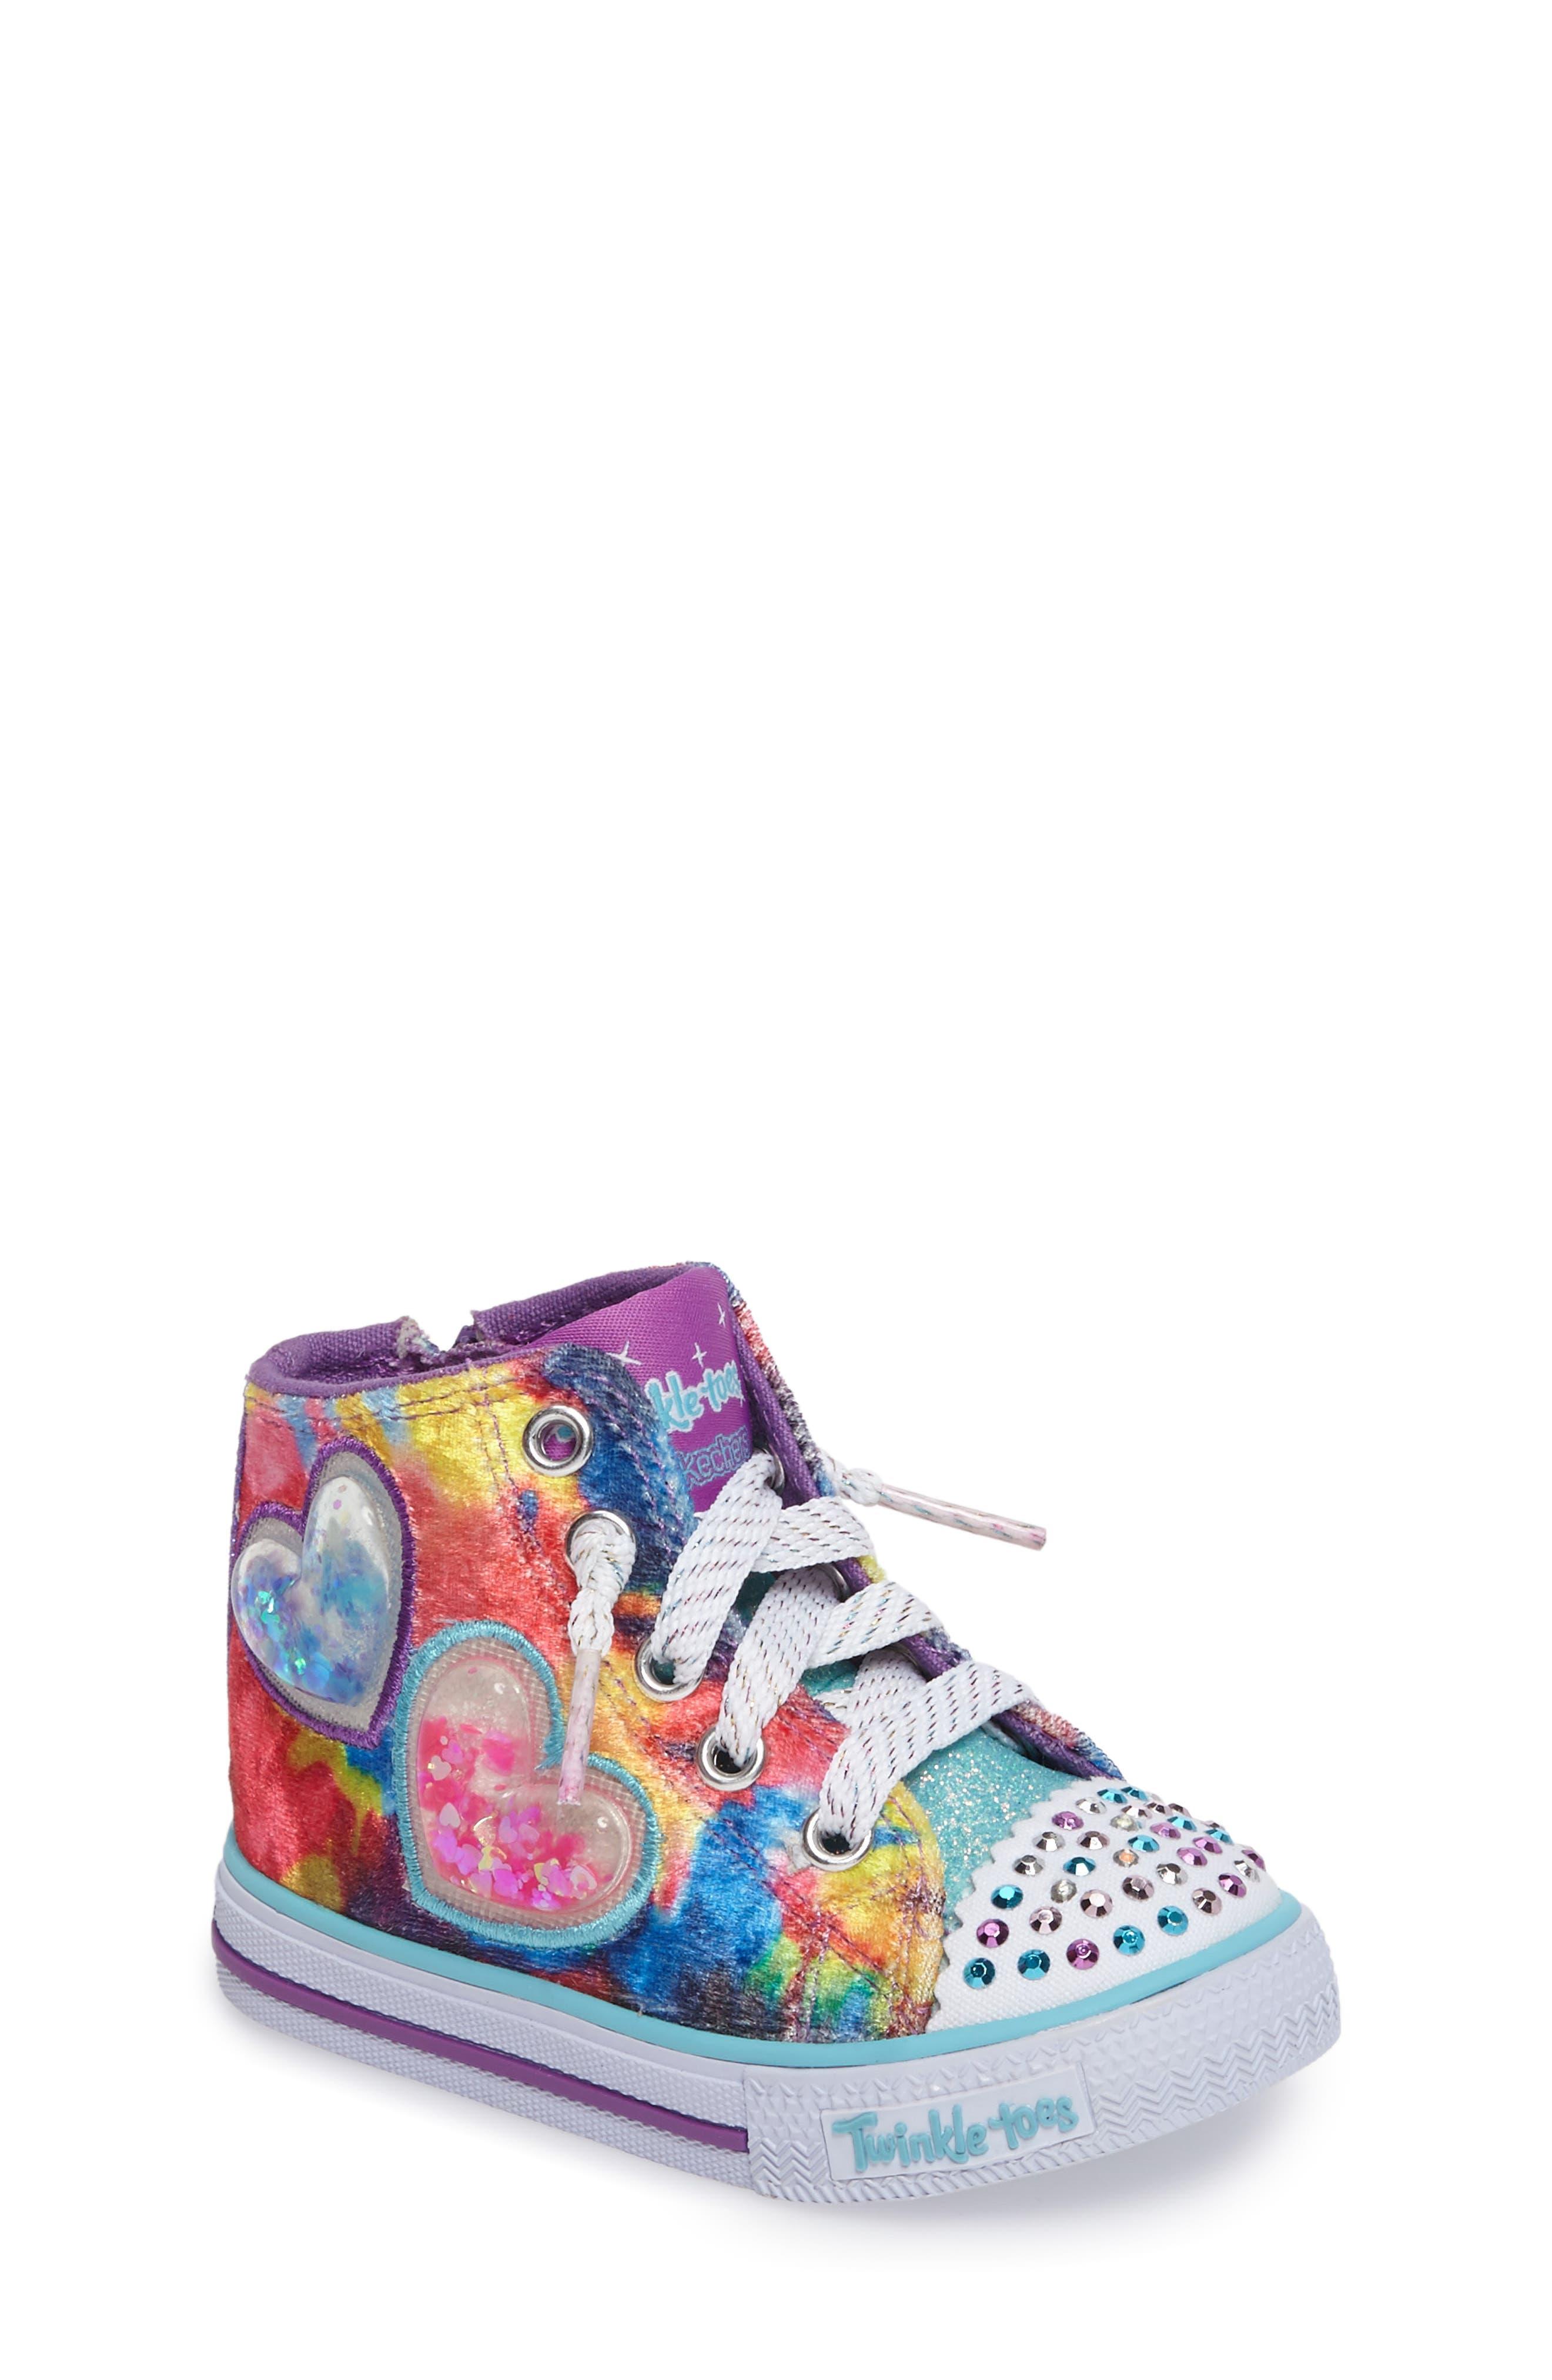 SKECHERS Twinkle Toes Shuffles High Top Sneaker (Walker & Toddler)